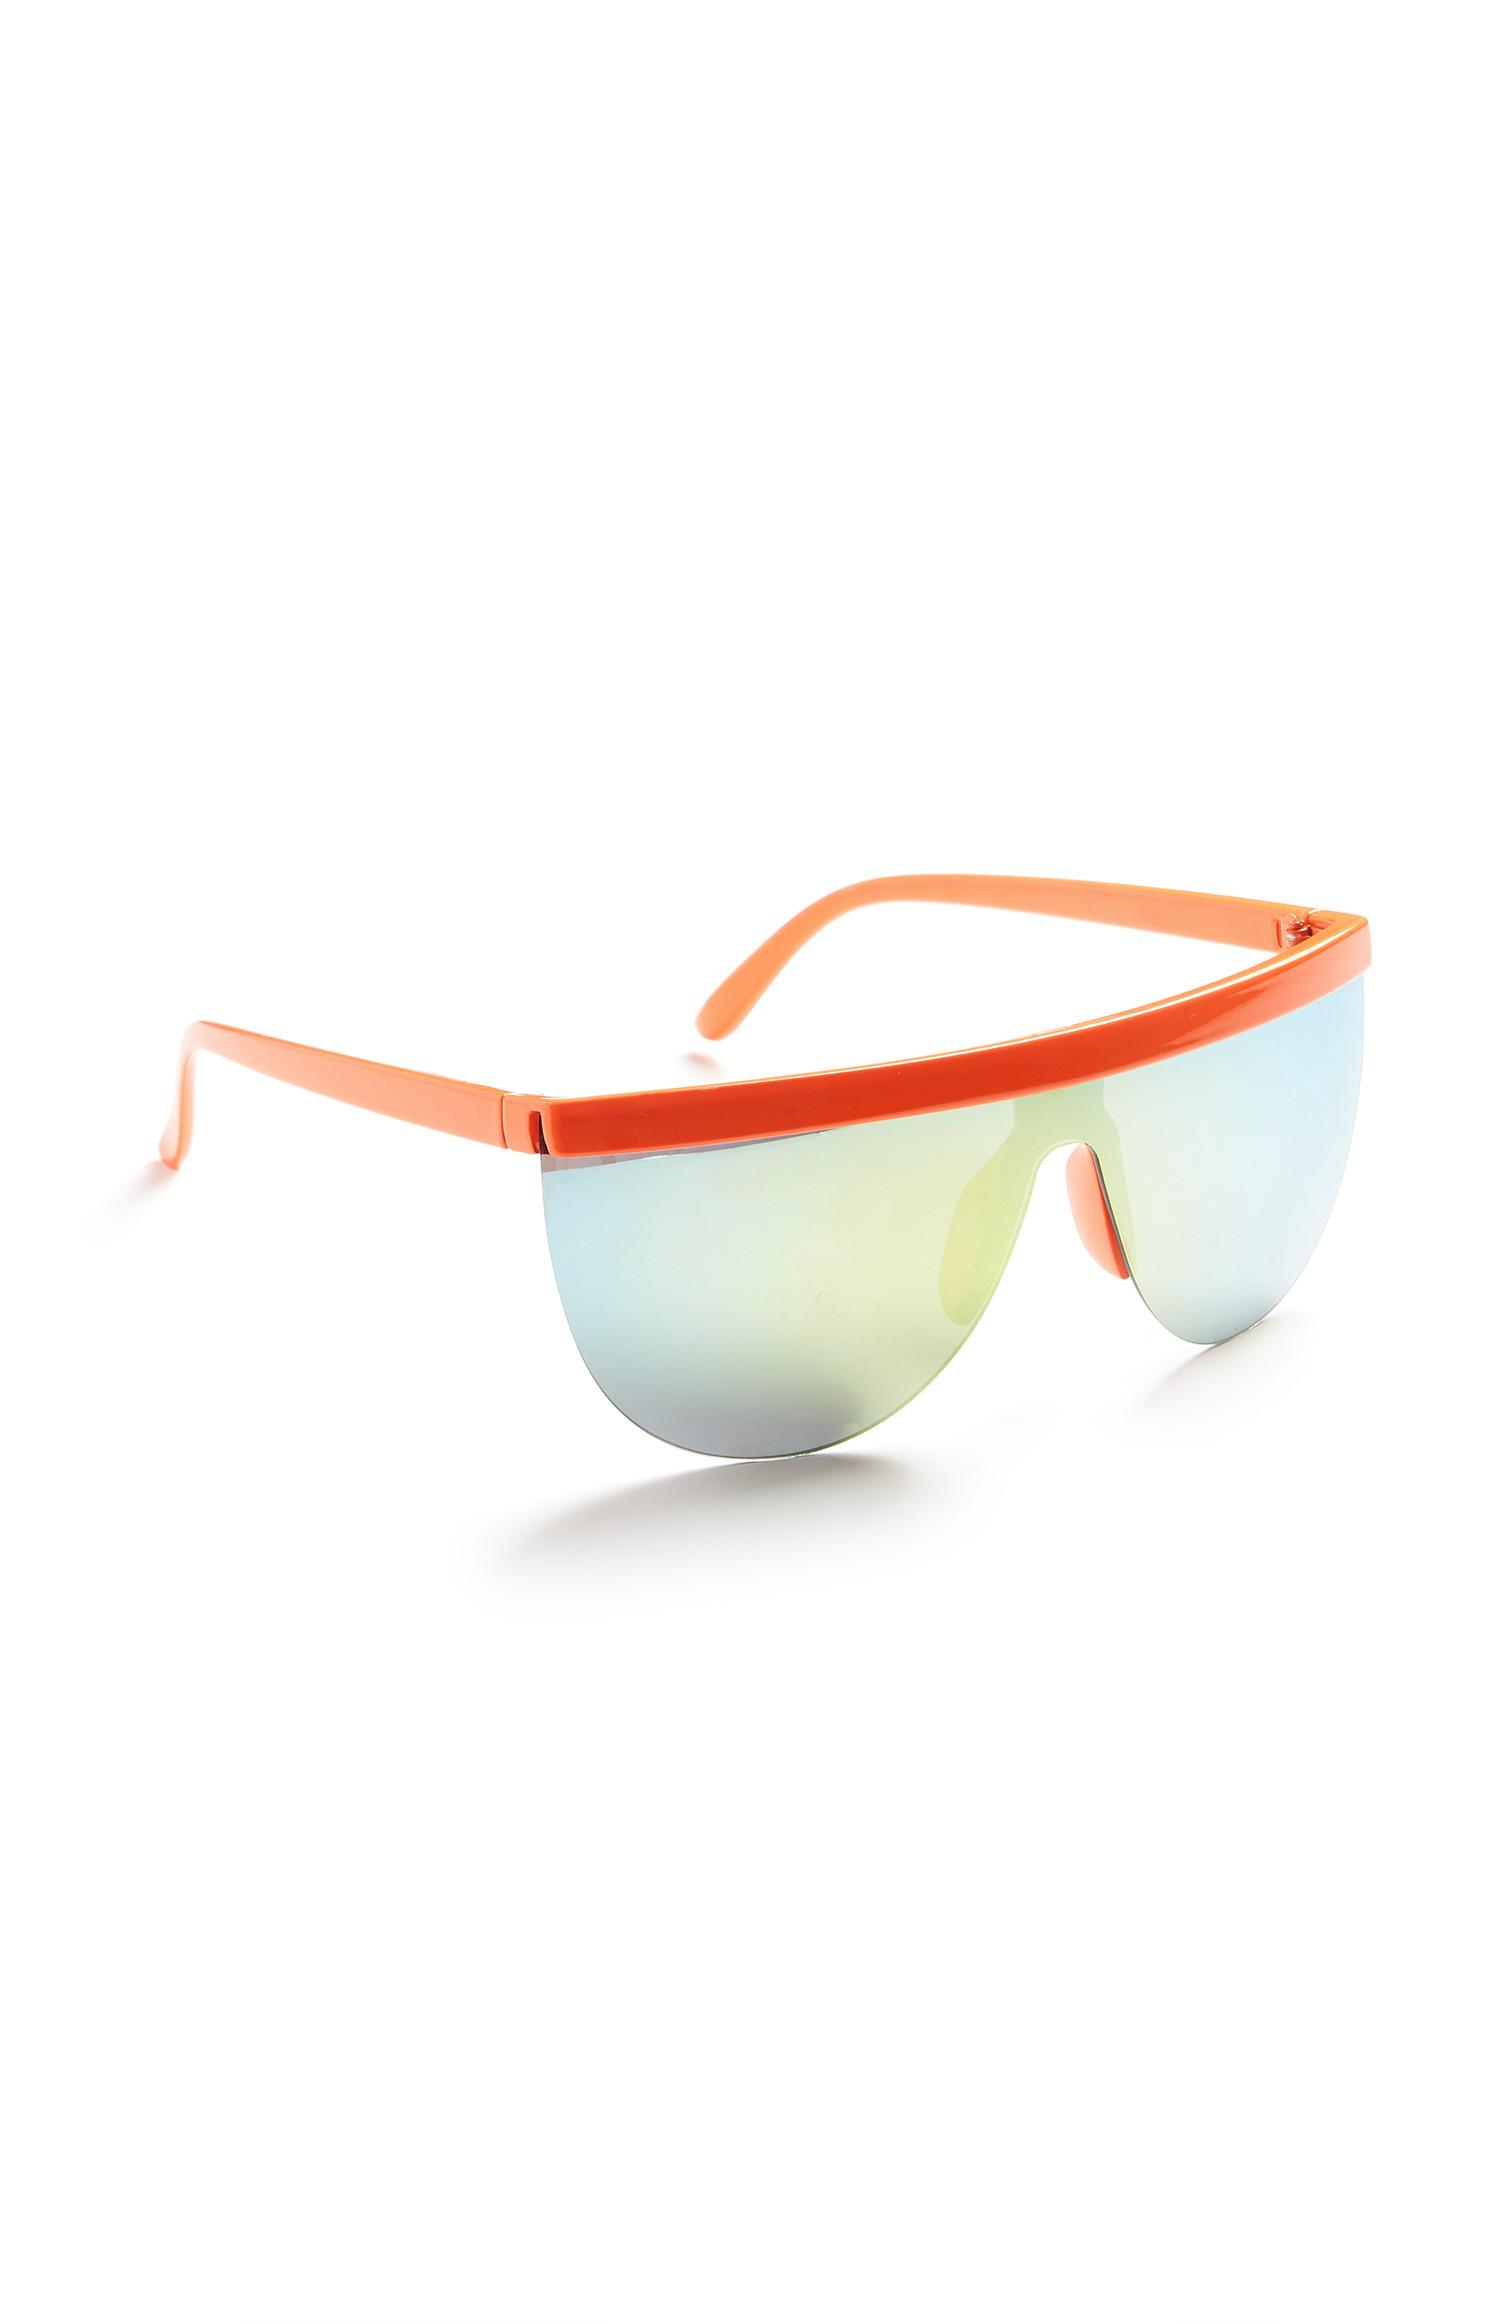 Feloranje sportbril